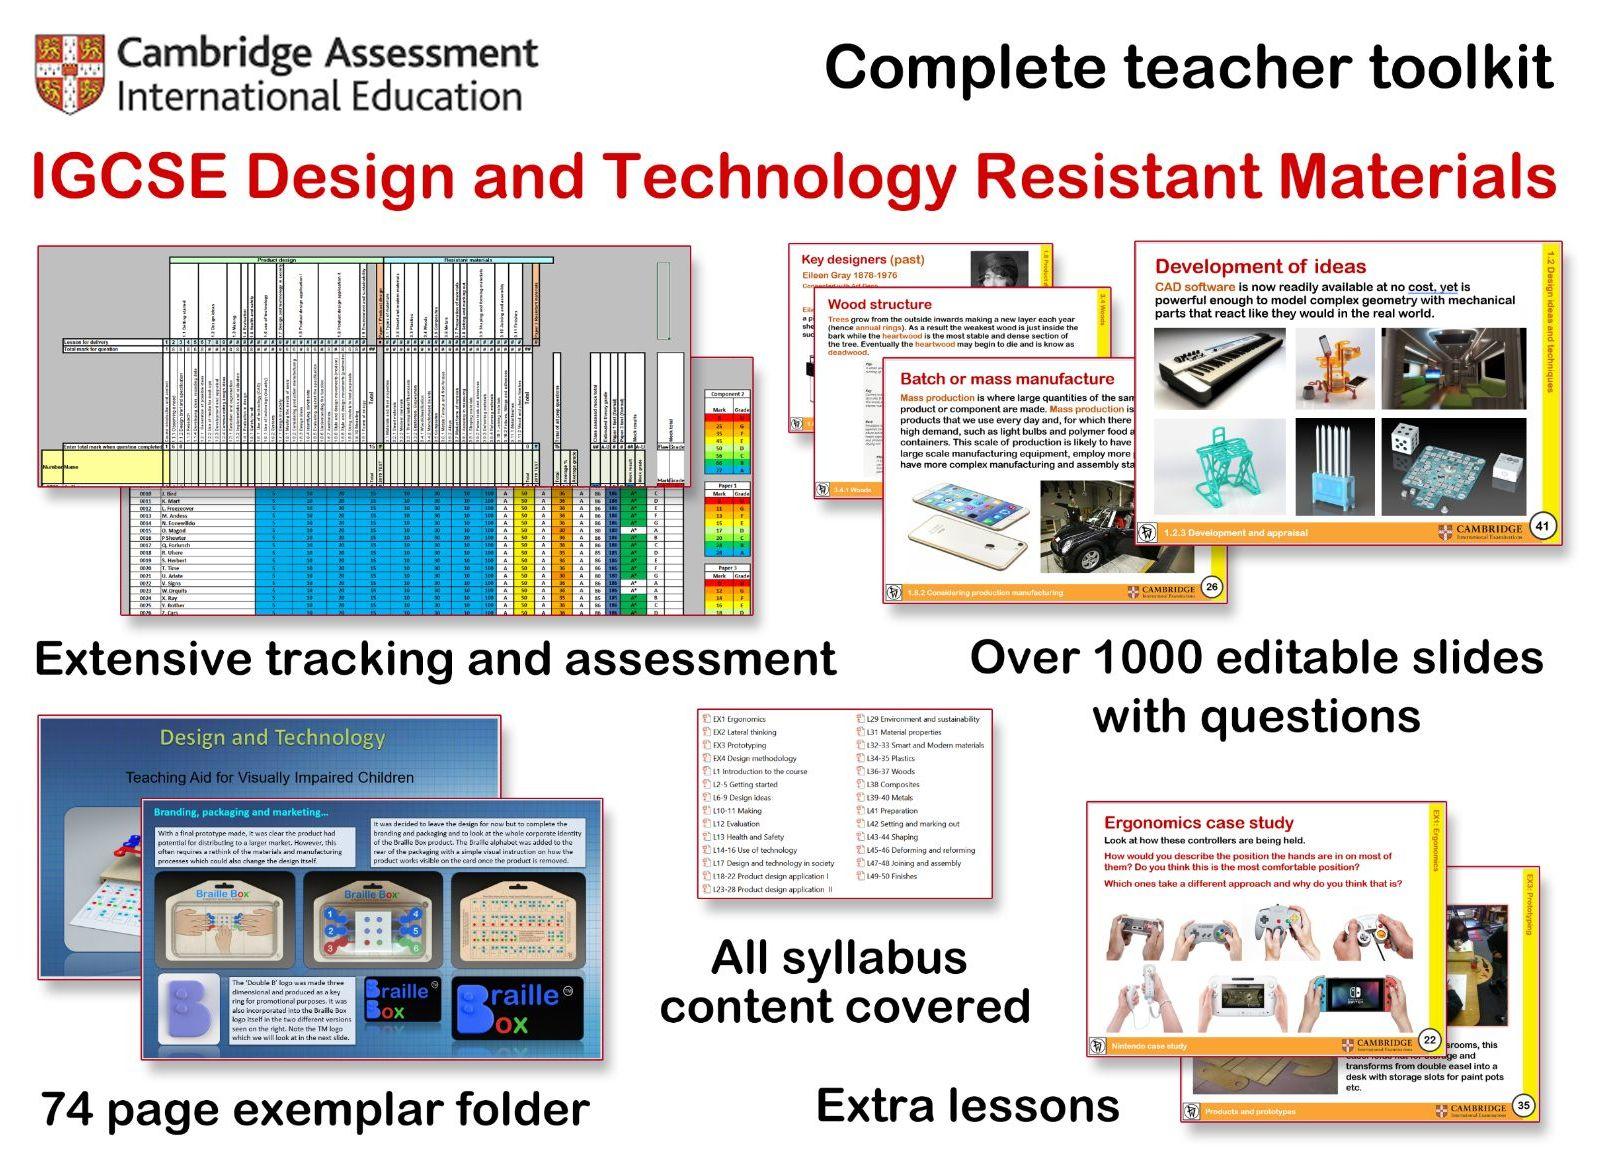 Cambridge IGCSE D&T complete teacher toolkit